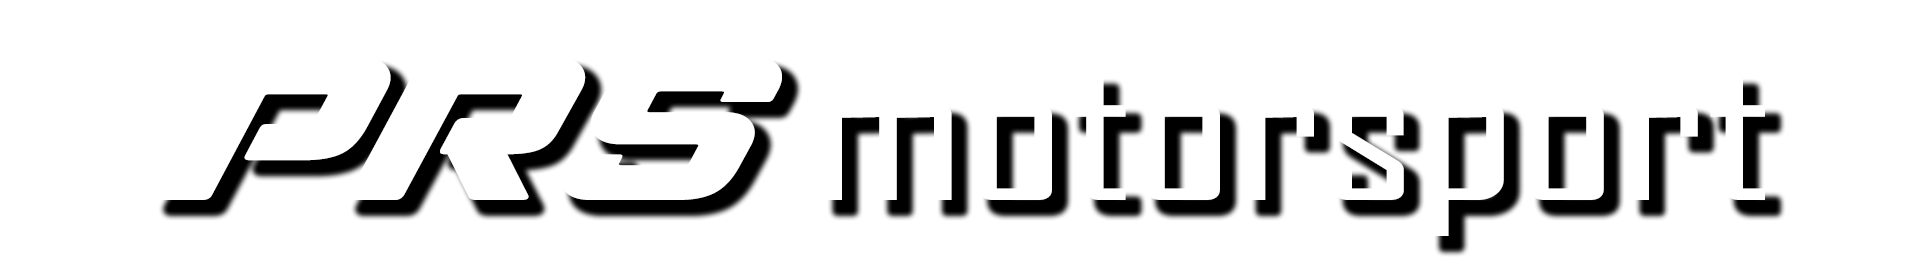 PRSmotorsport